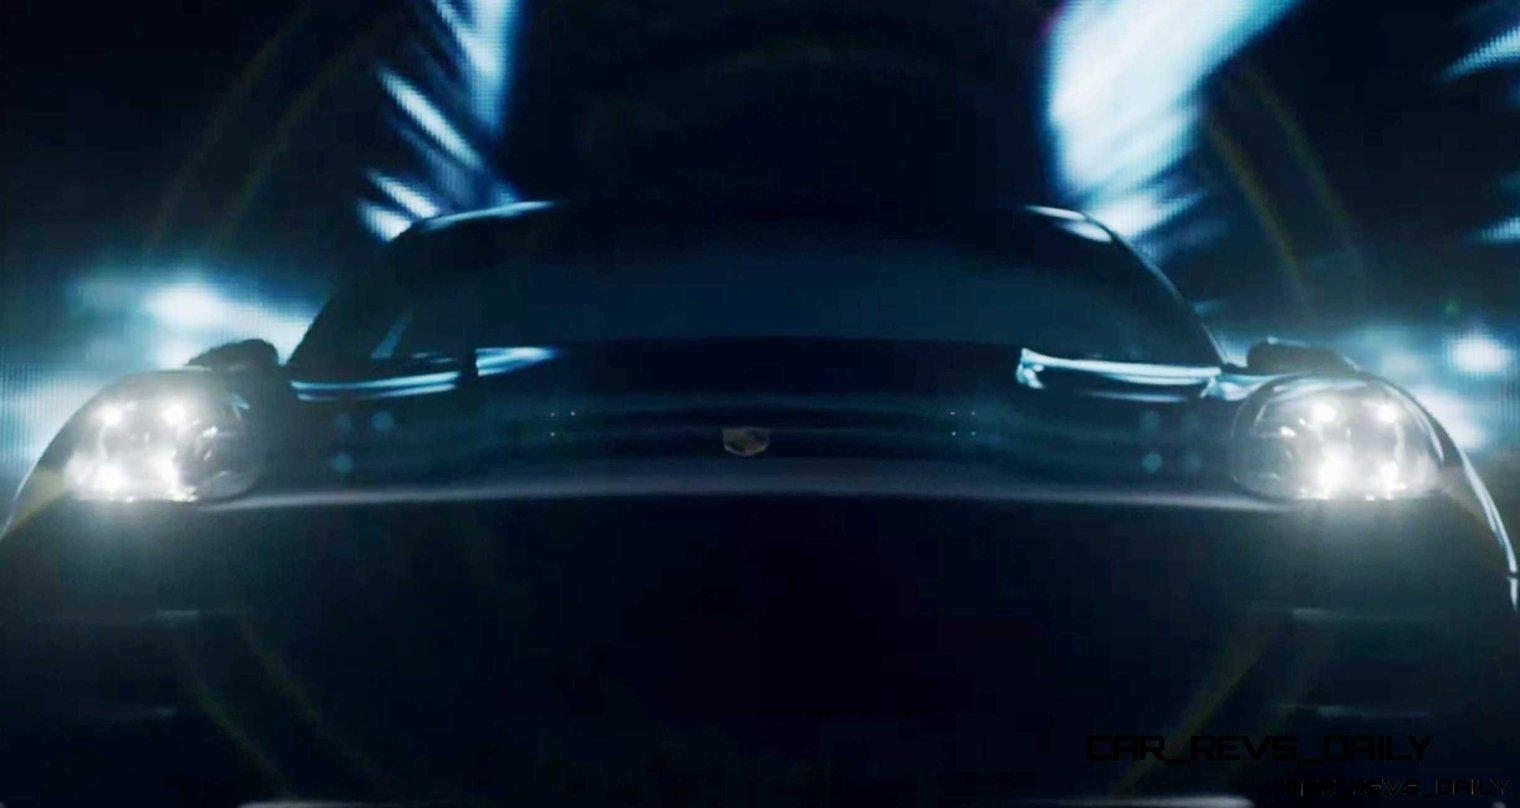 2015 Porsche Macan - Latest Images - CarRevsDaily.com 40